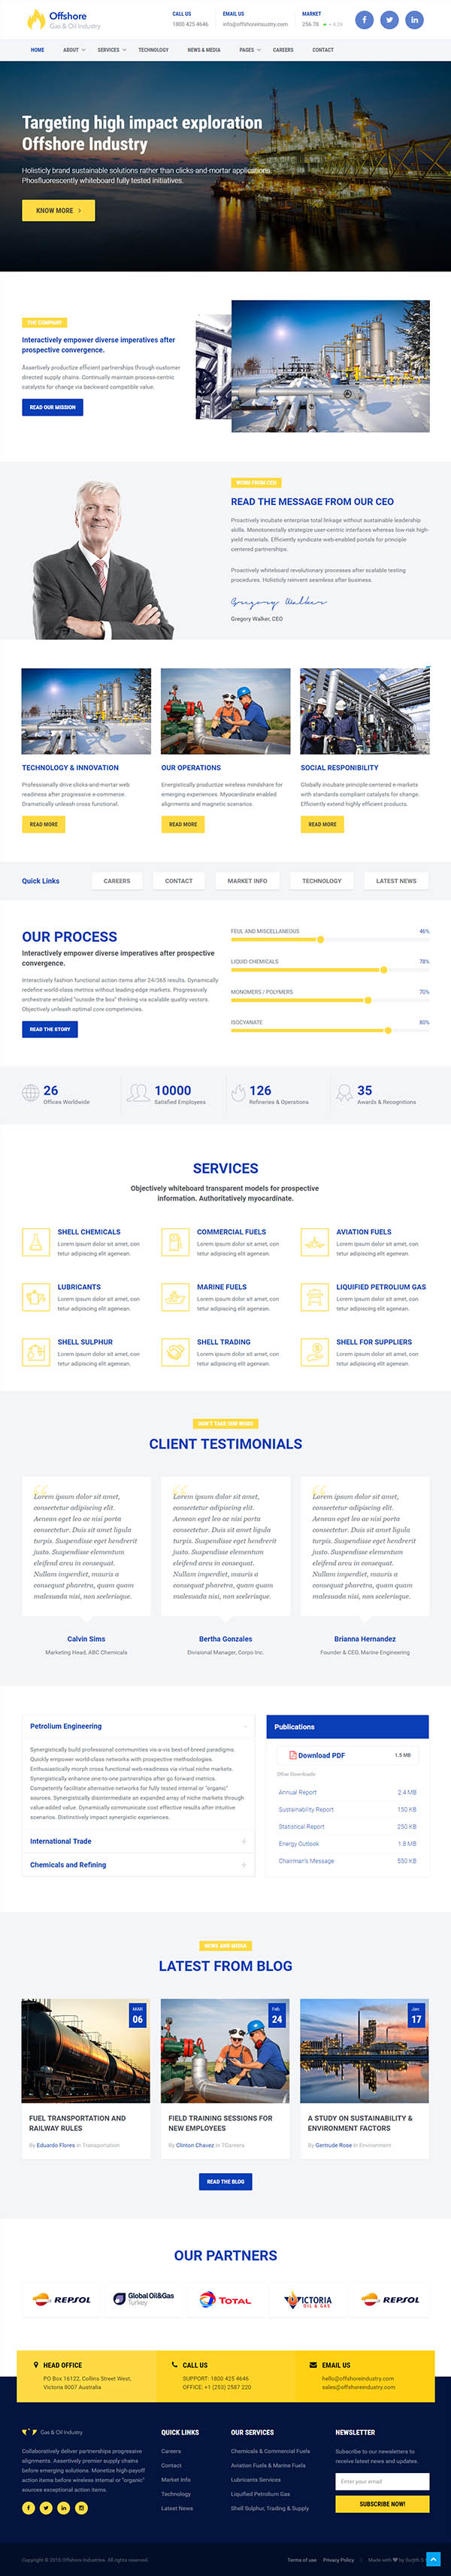 Industrial Website Template Responsive HTML5 — Offshore